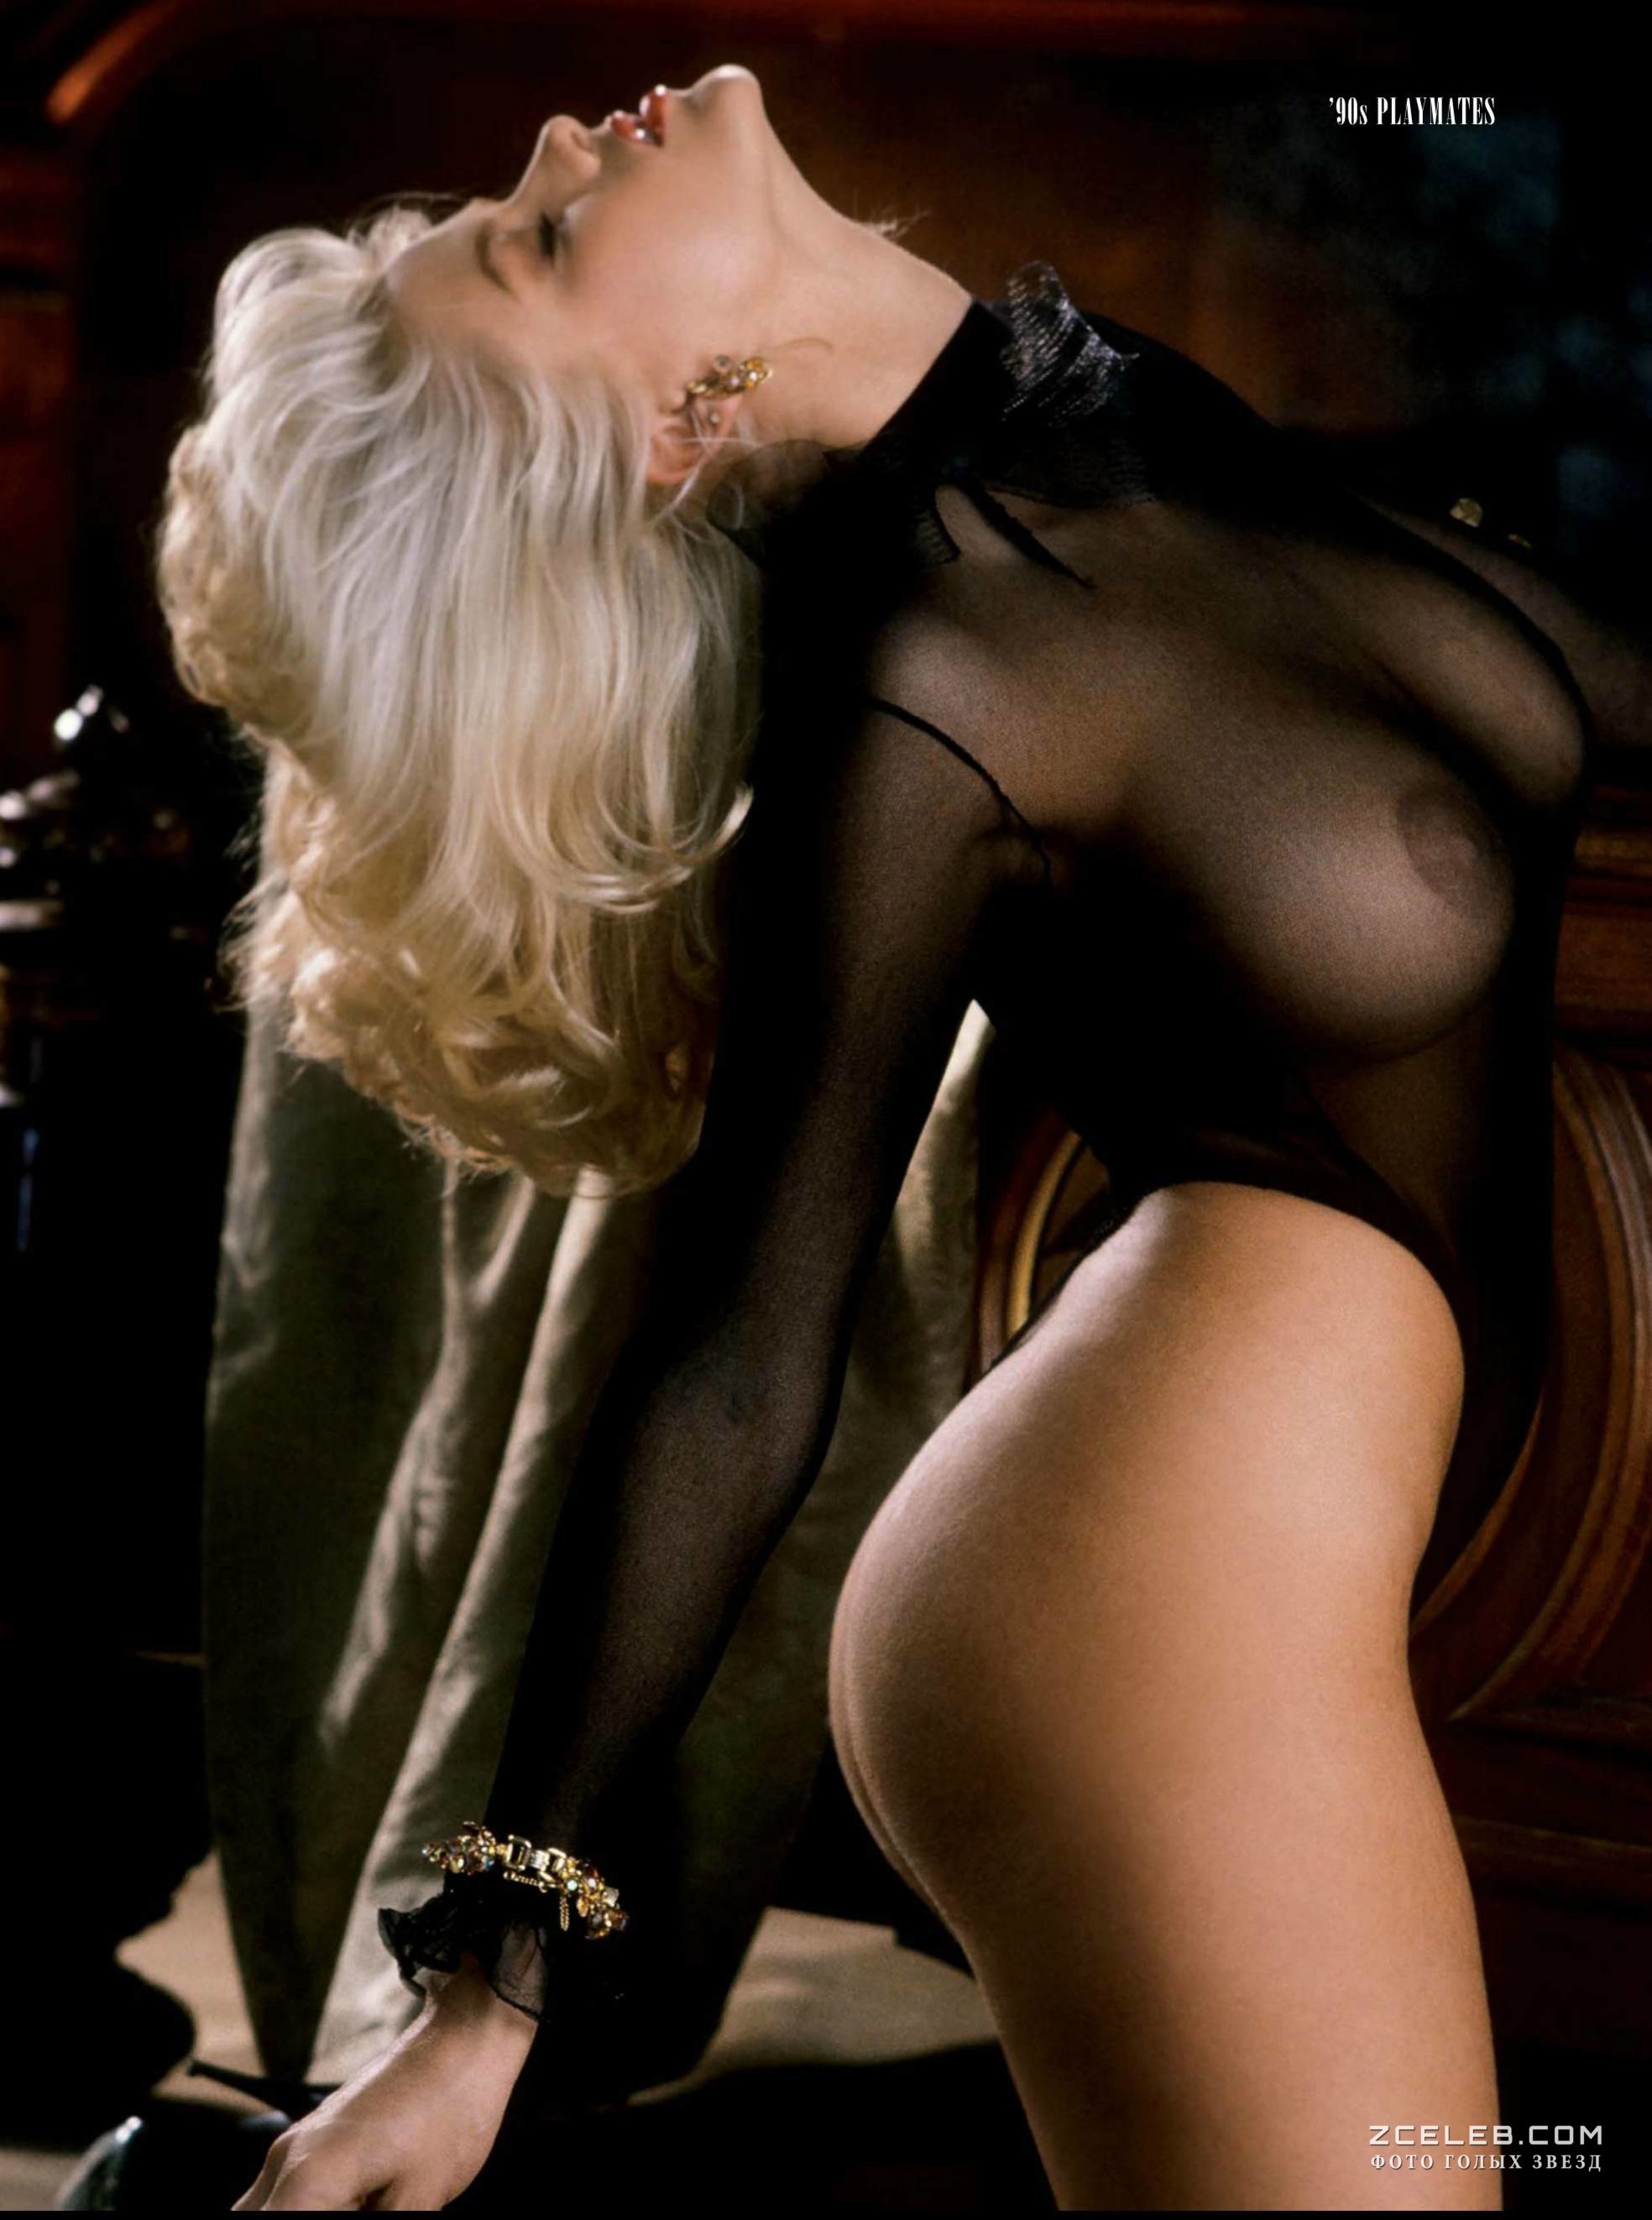 Anna Nicole Smith Playboy Playmate